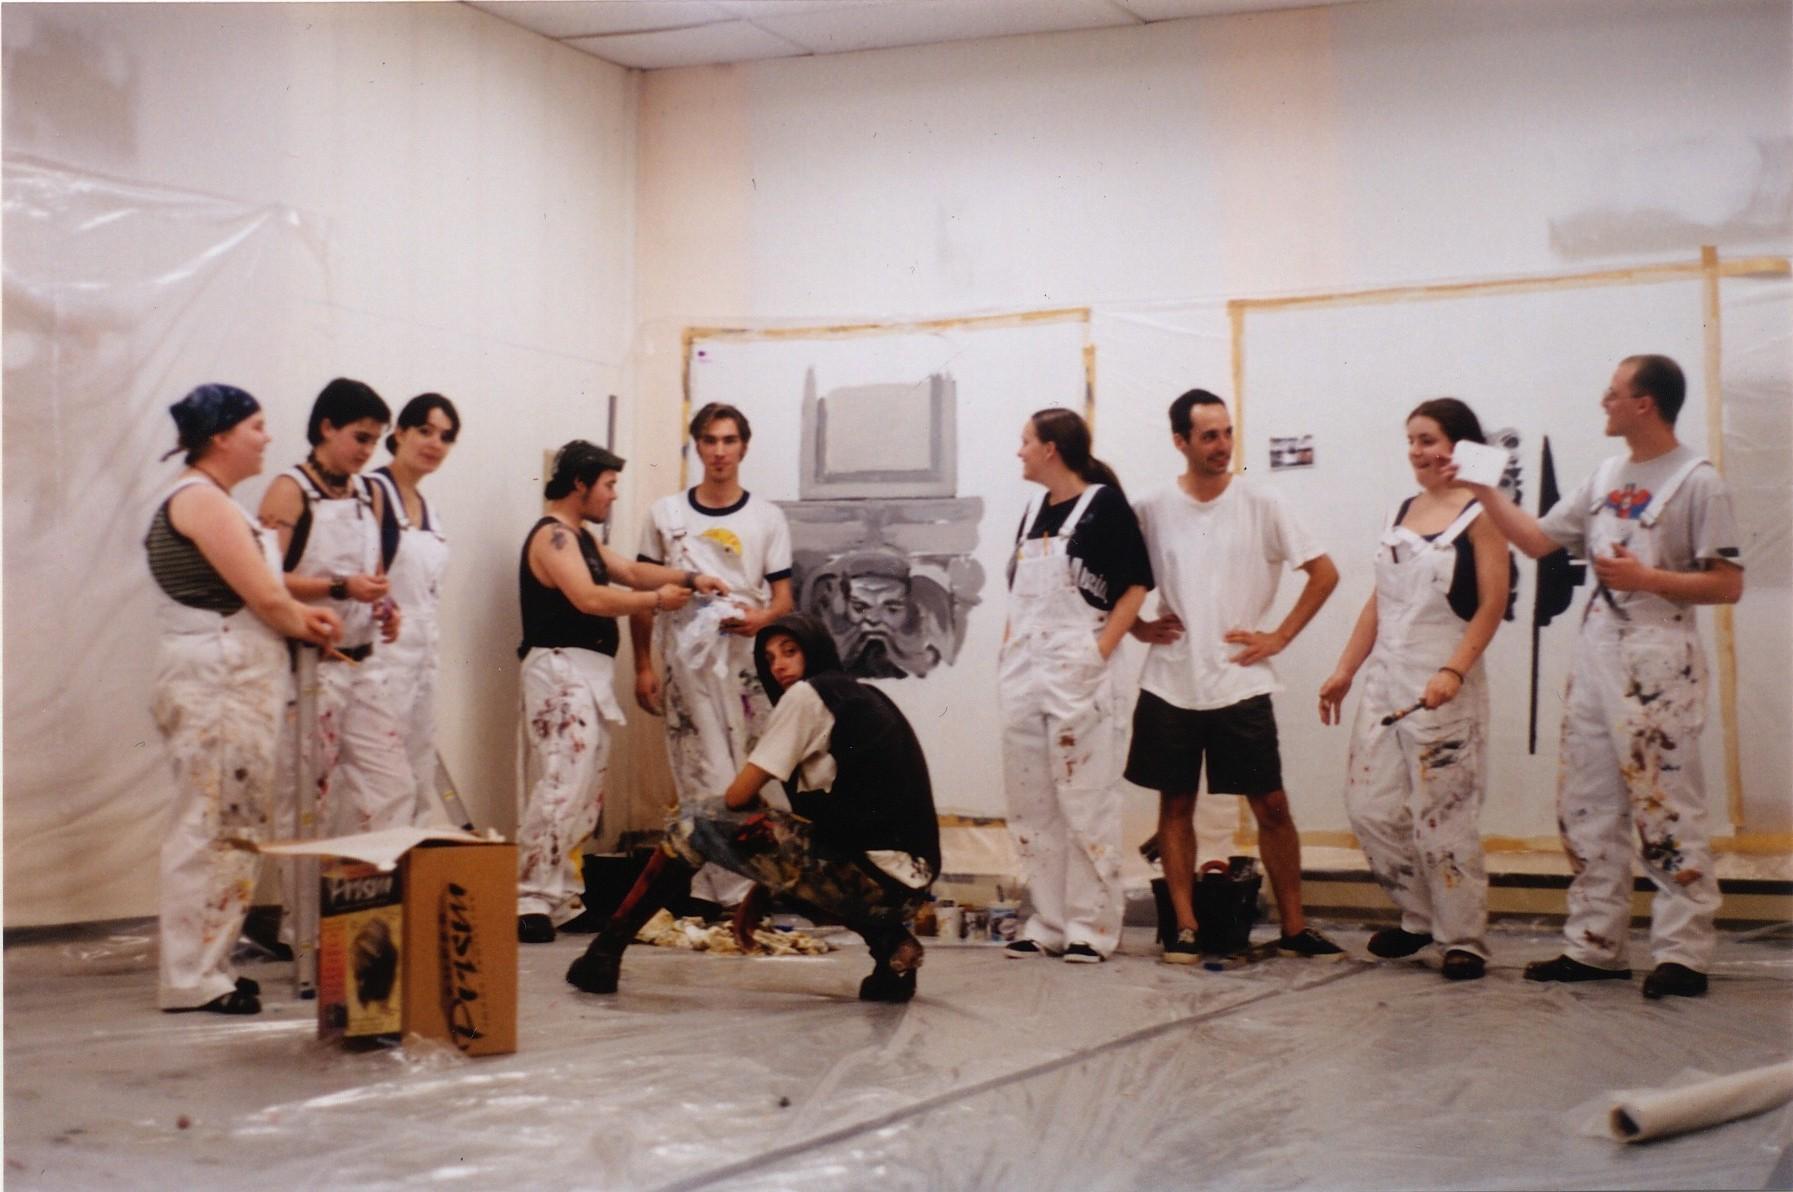 Les muralistes